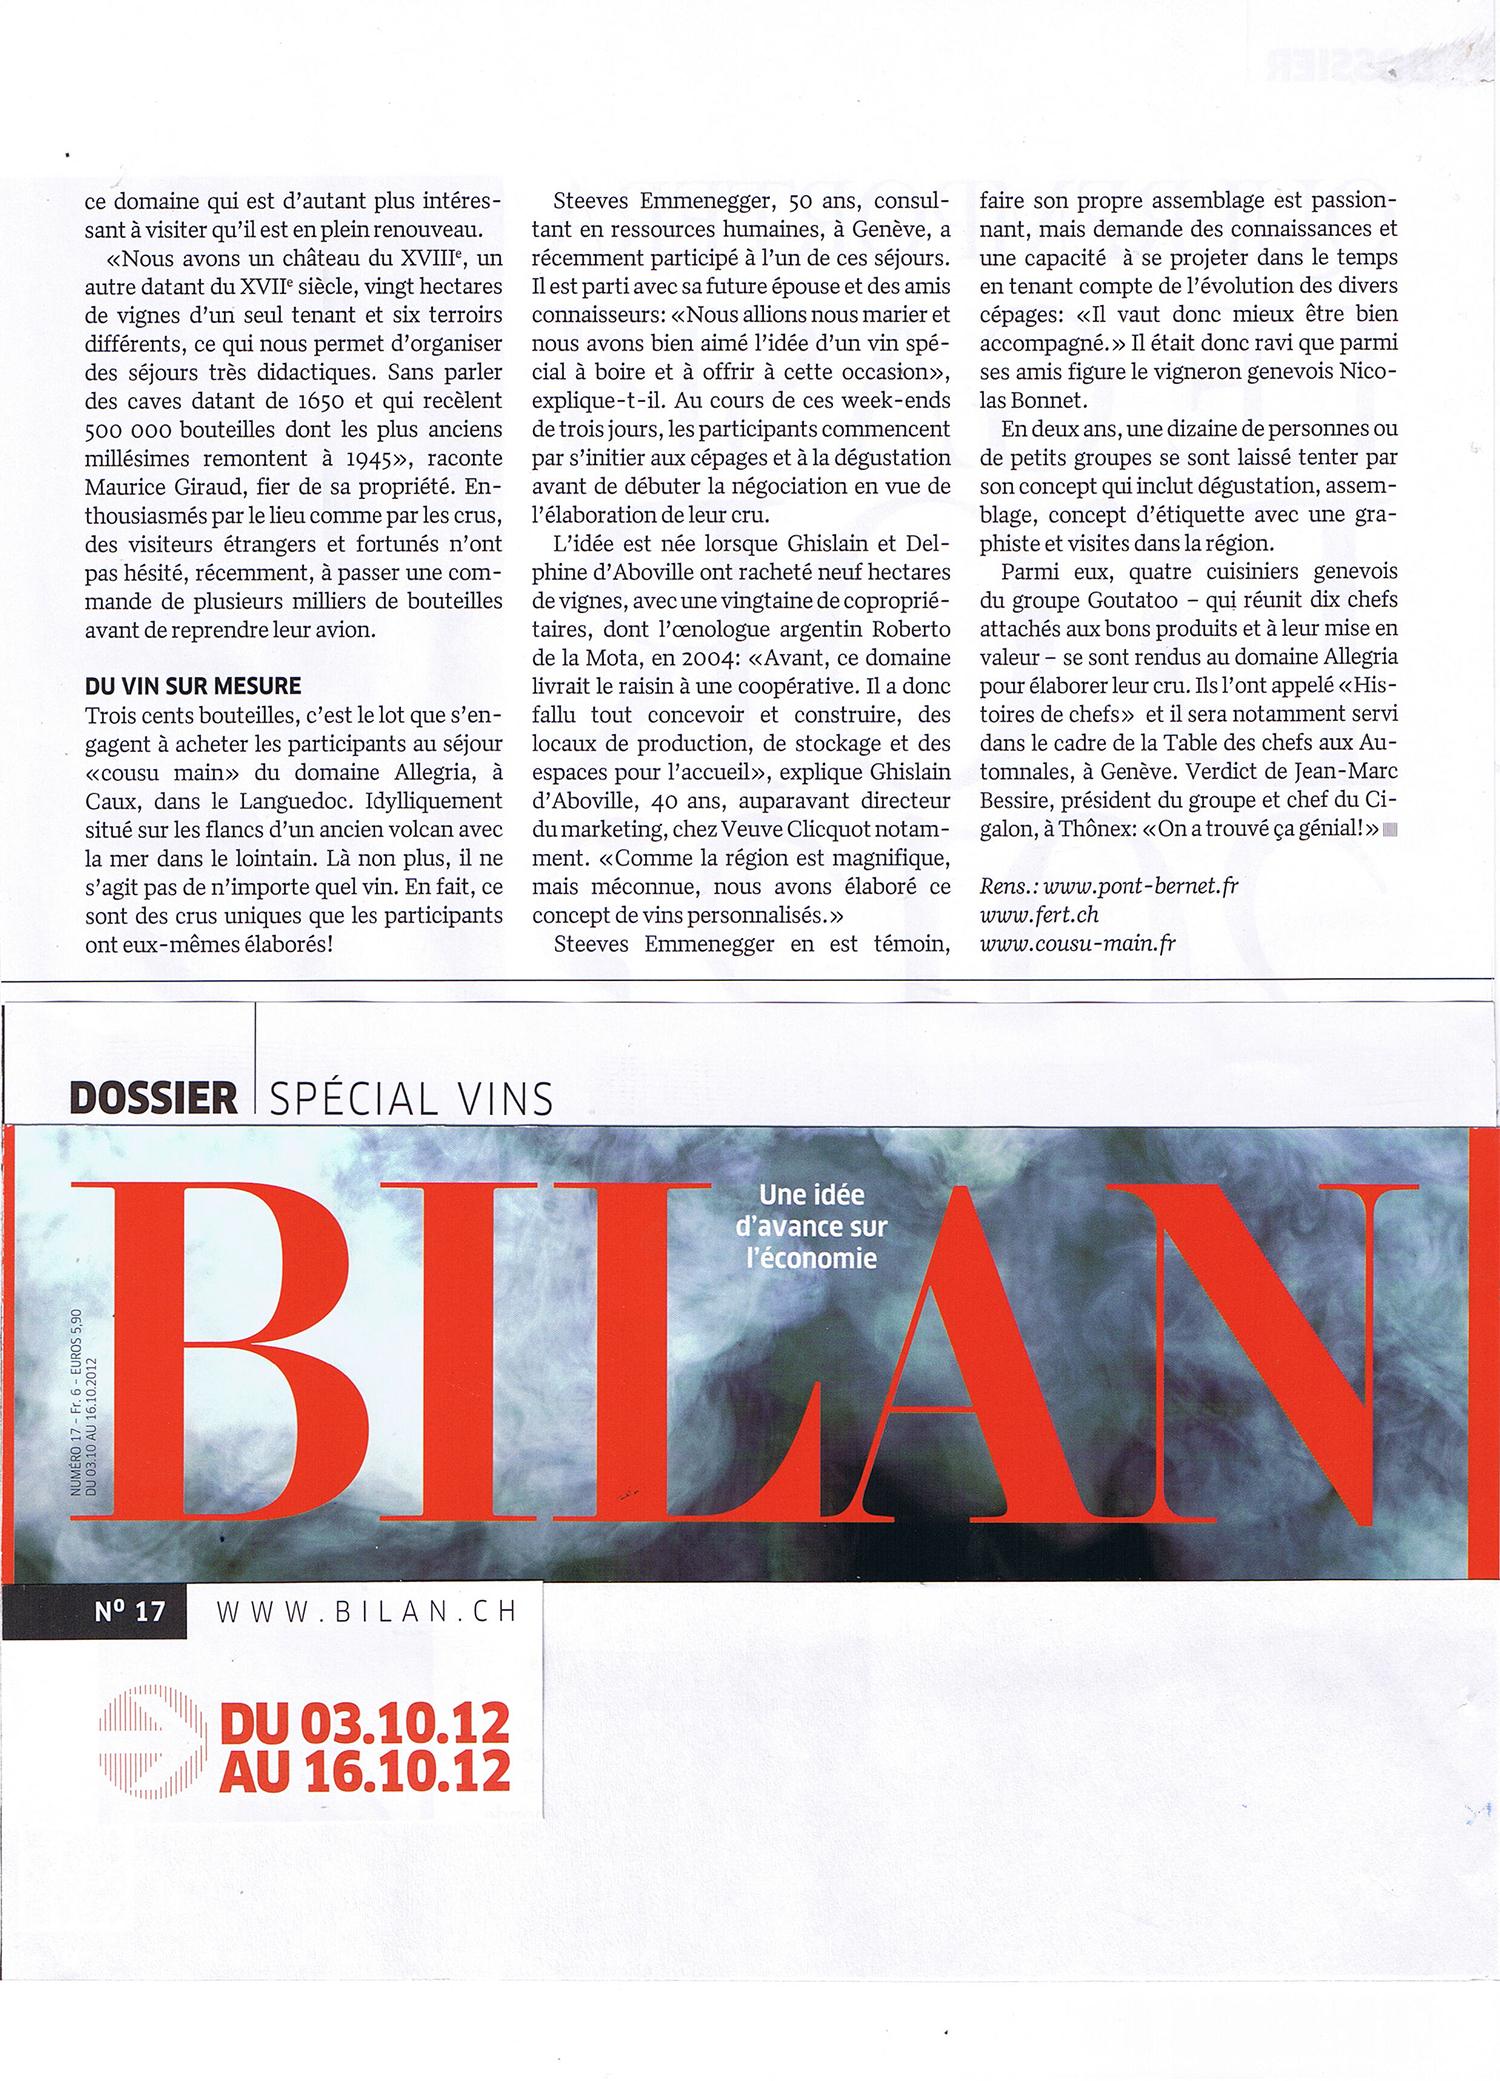 2012.10.Bilan-2